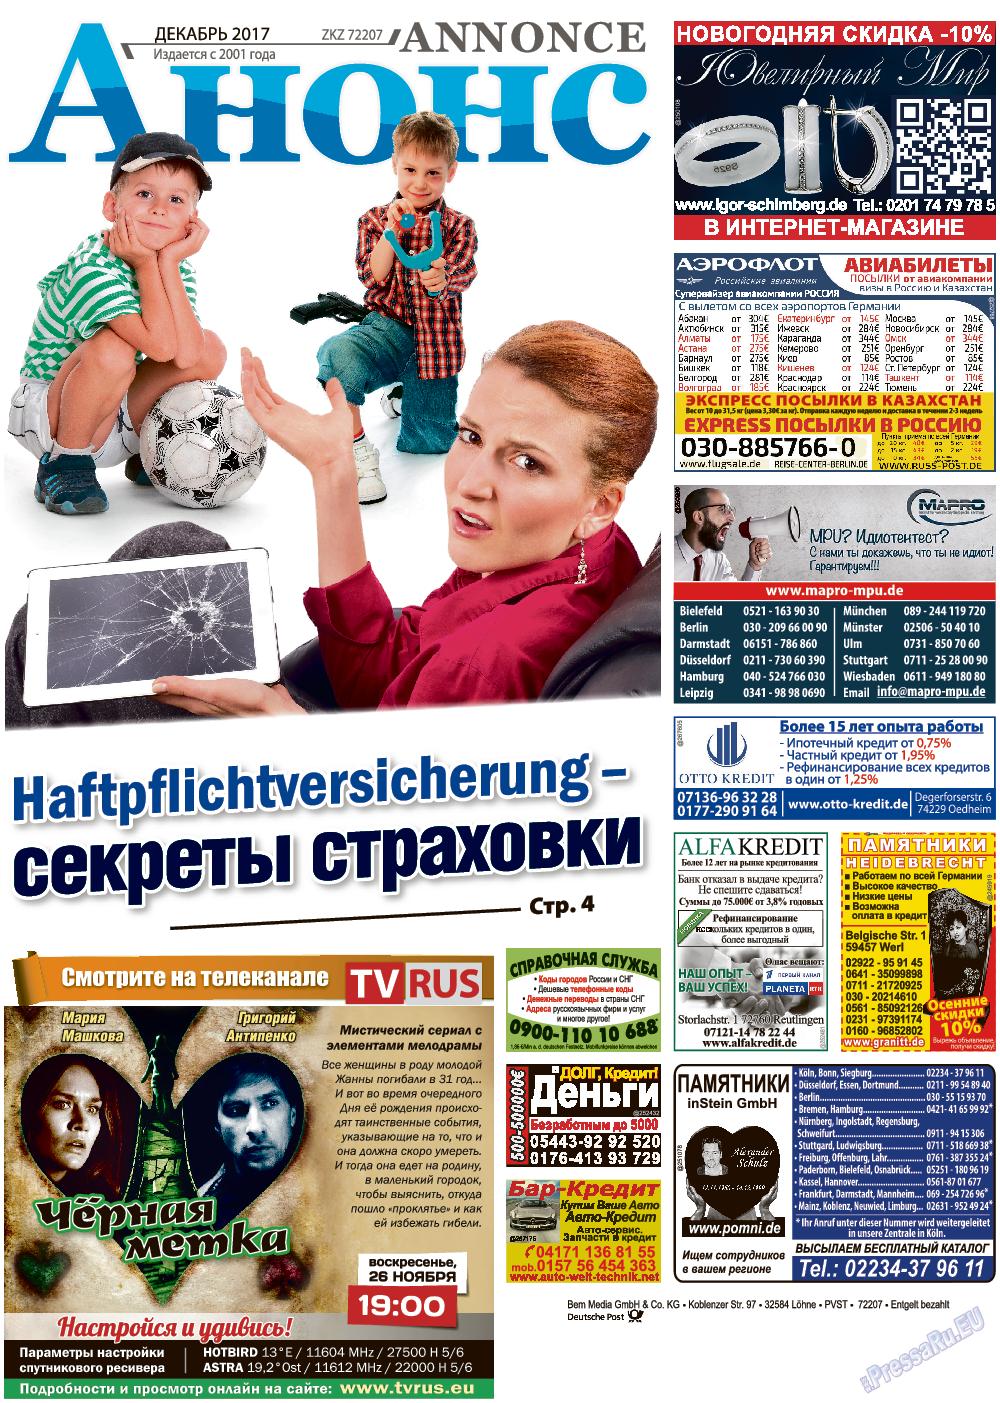 Анонс (газета). 2017 год, номер 12, стр. 1